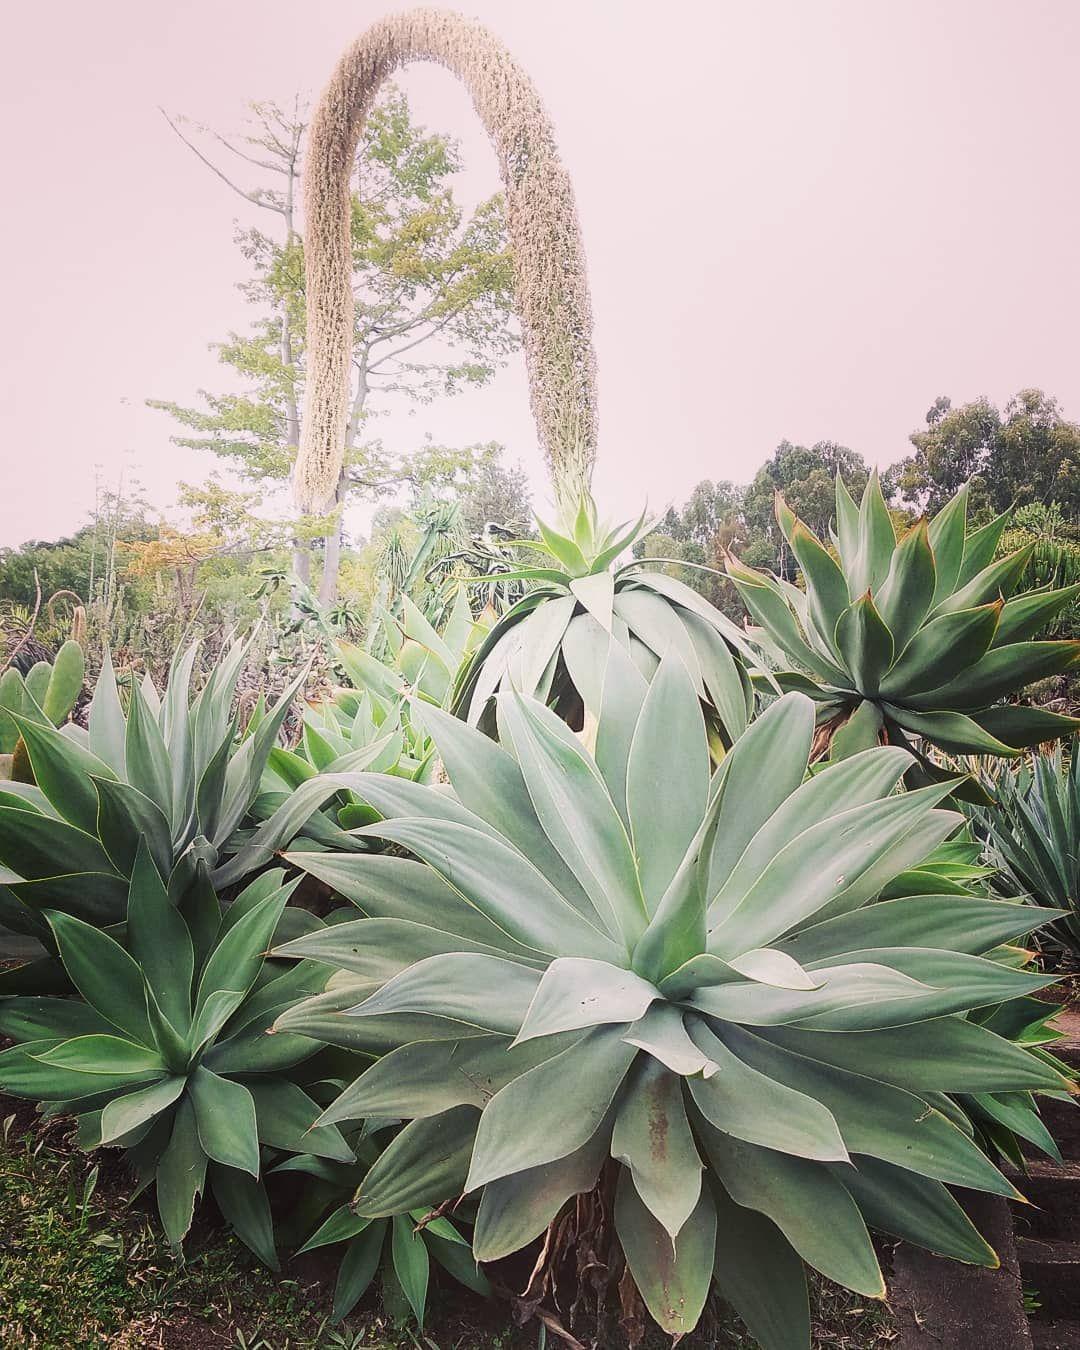 Ile Reunion Arbre Tree Forest Foret Plante Plantesucculente